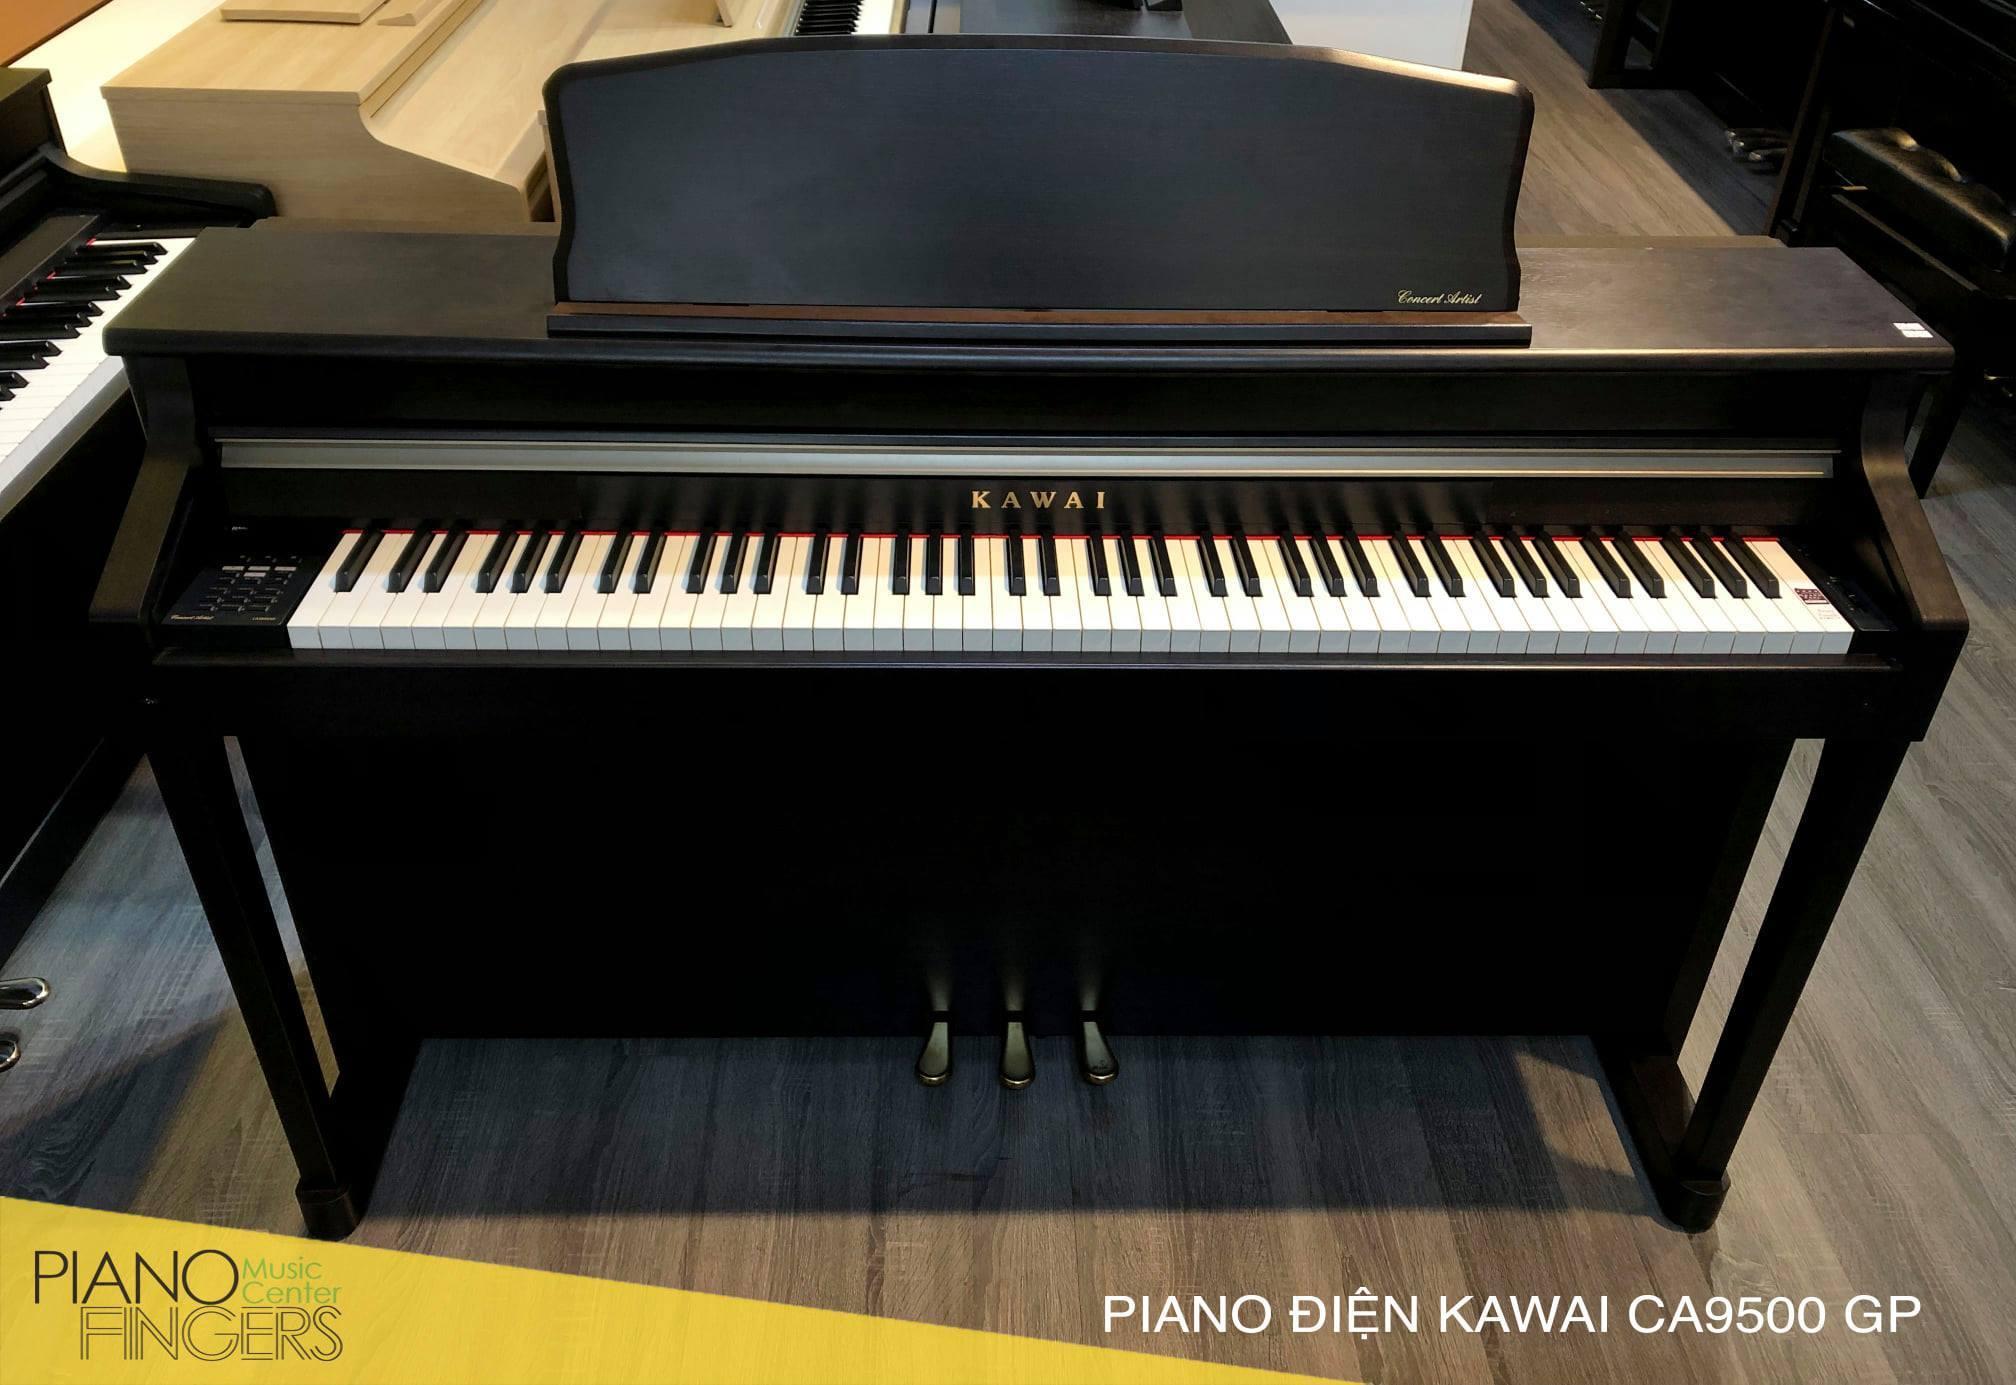 Piano điện Kawai CA 9500 GP